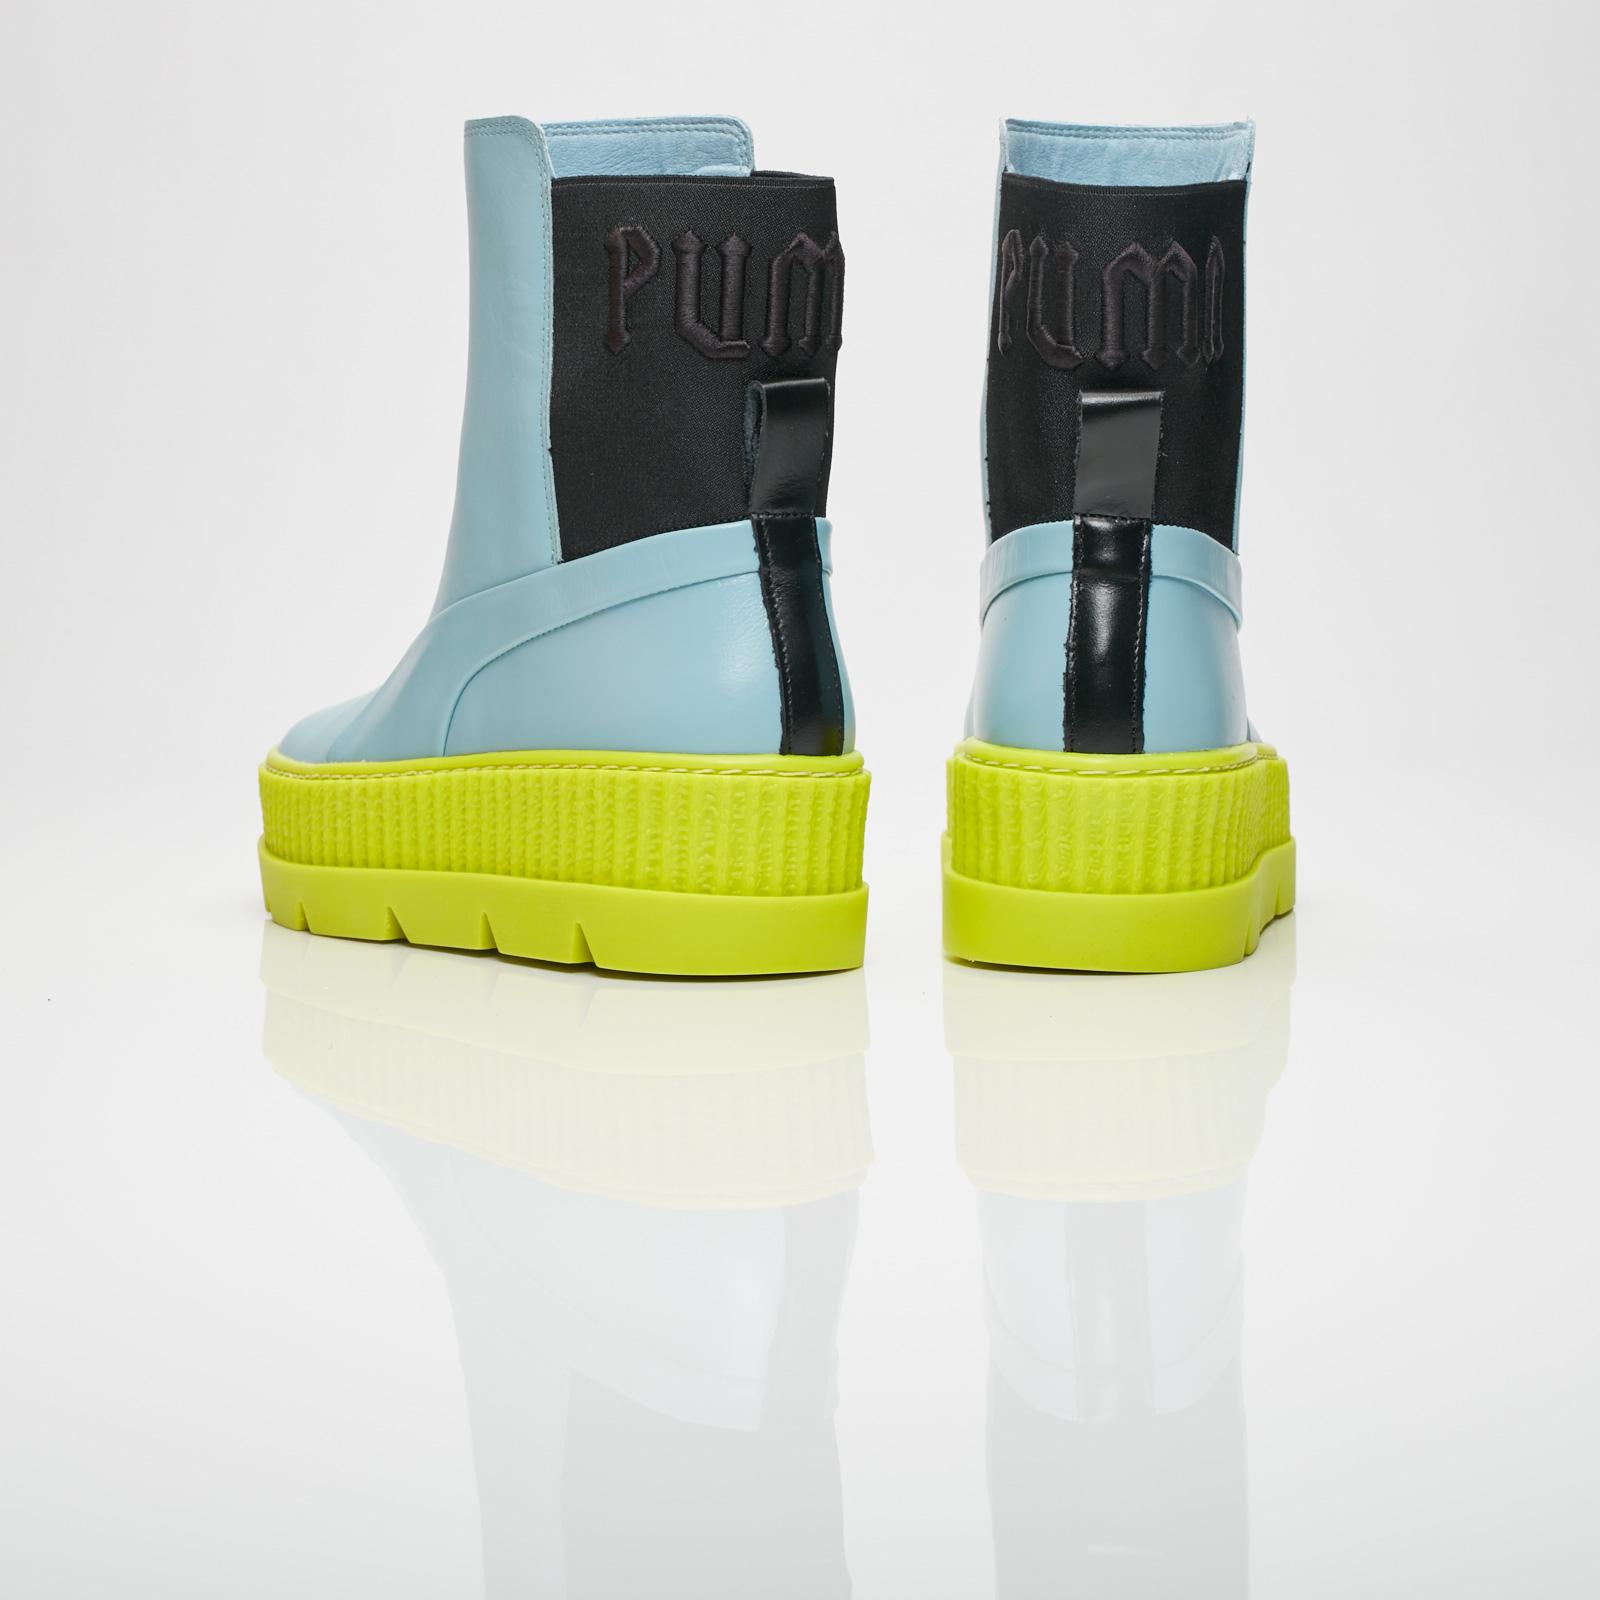 brand new b931a 778e4 Puma Chelsea Sneaker Boot Wns - 366266-01 - Sneakersnstuff ...